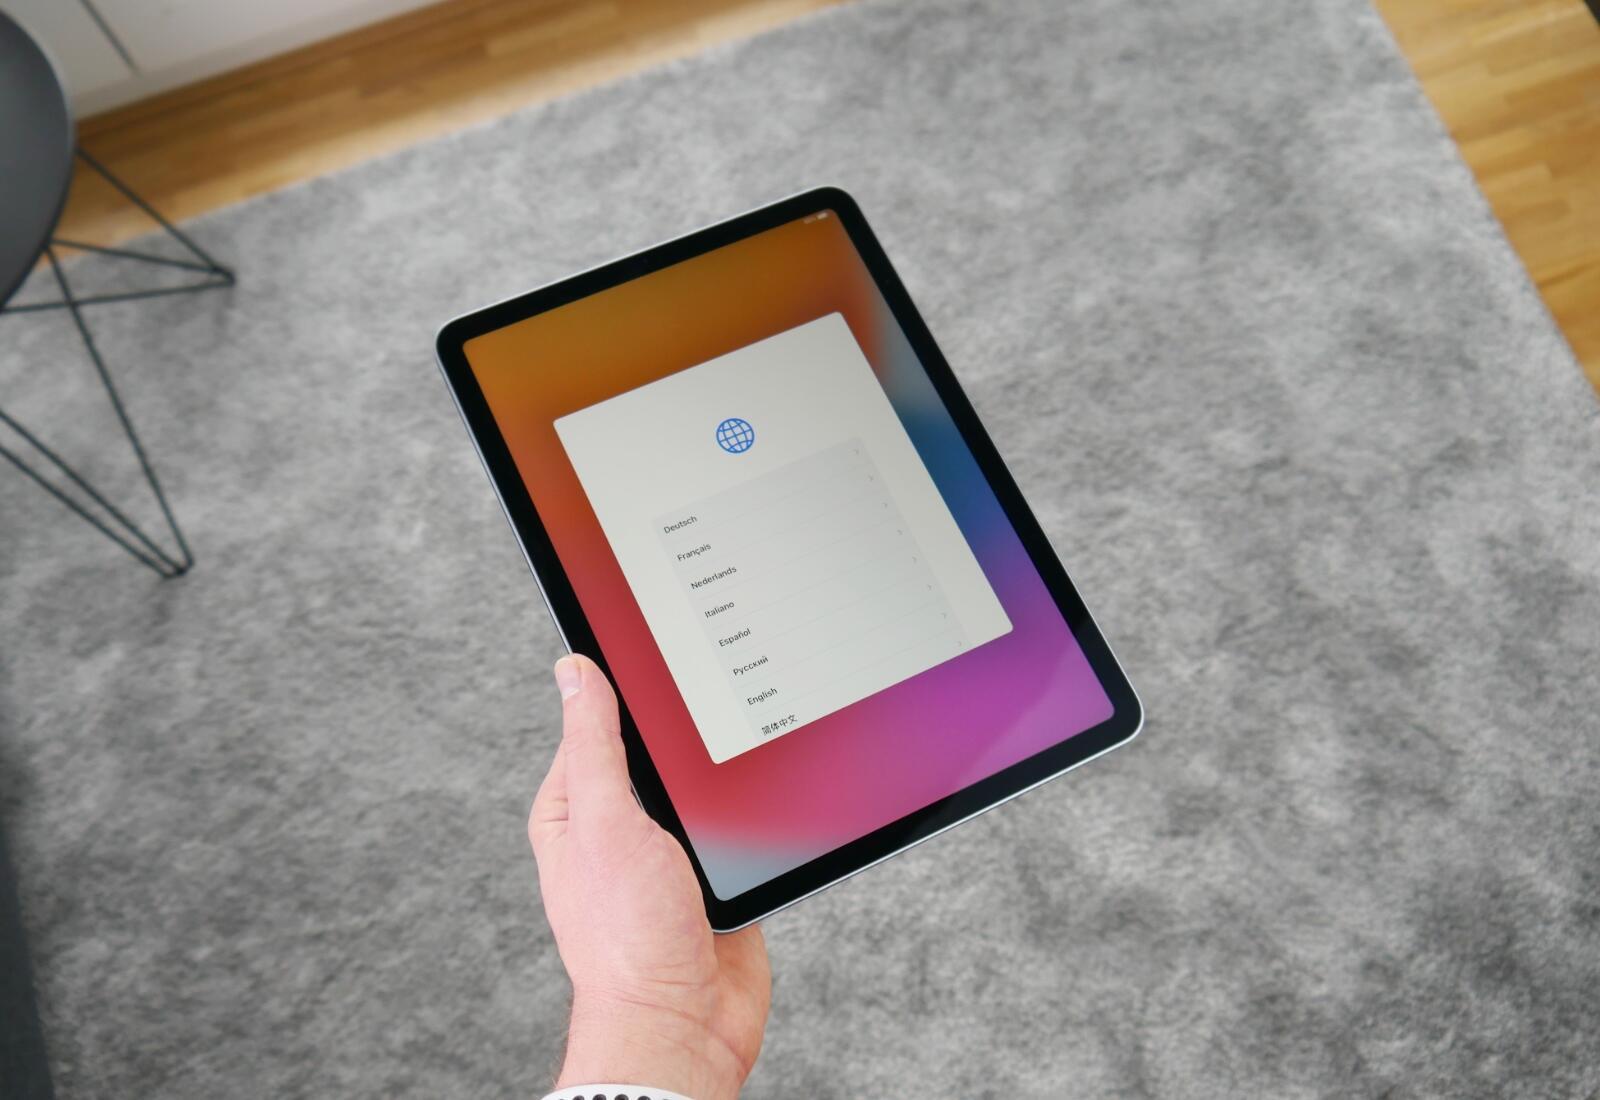 Apple Ipad Air 4 Display